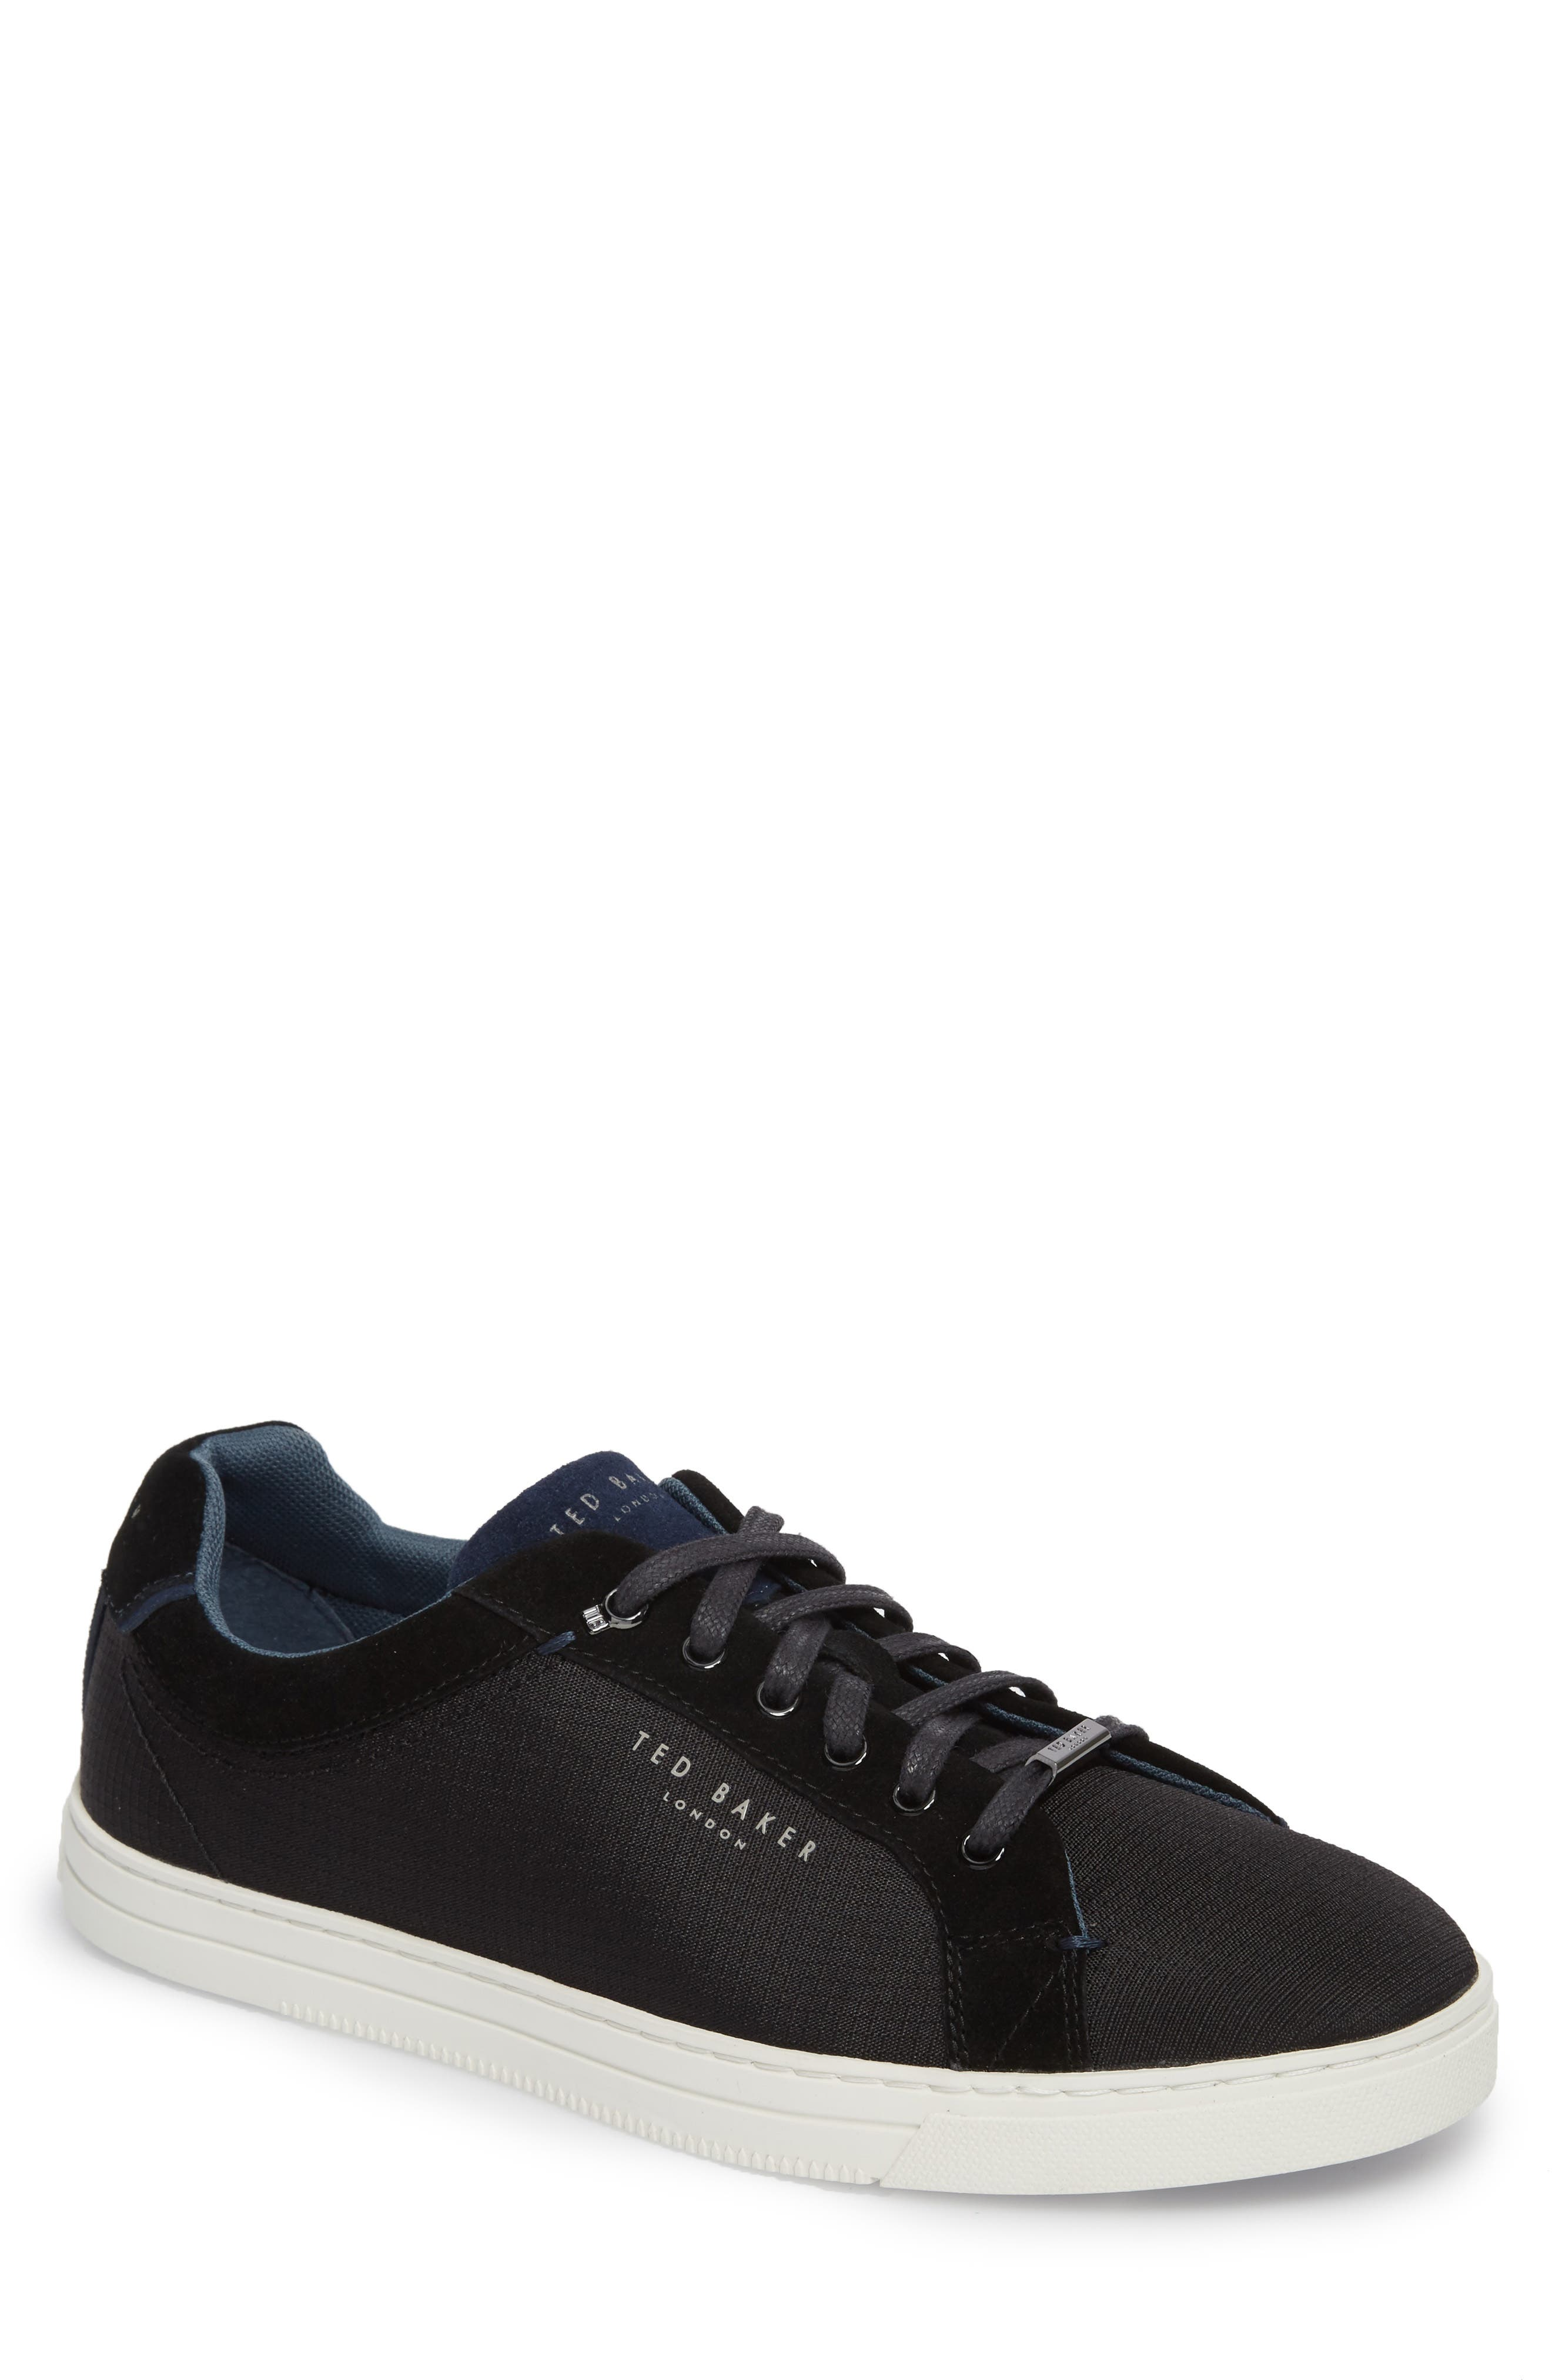 Klemes Sneaker,                             Main thumbnail 1, color,                             Black Textile